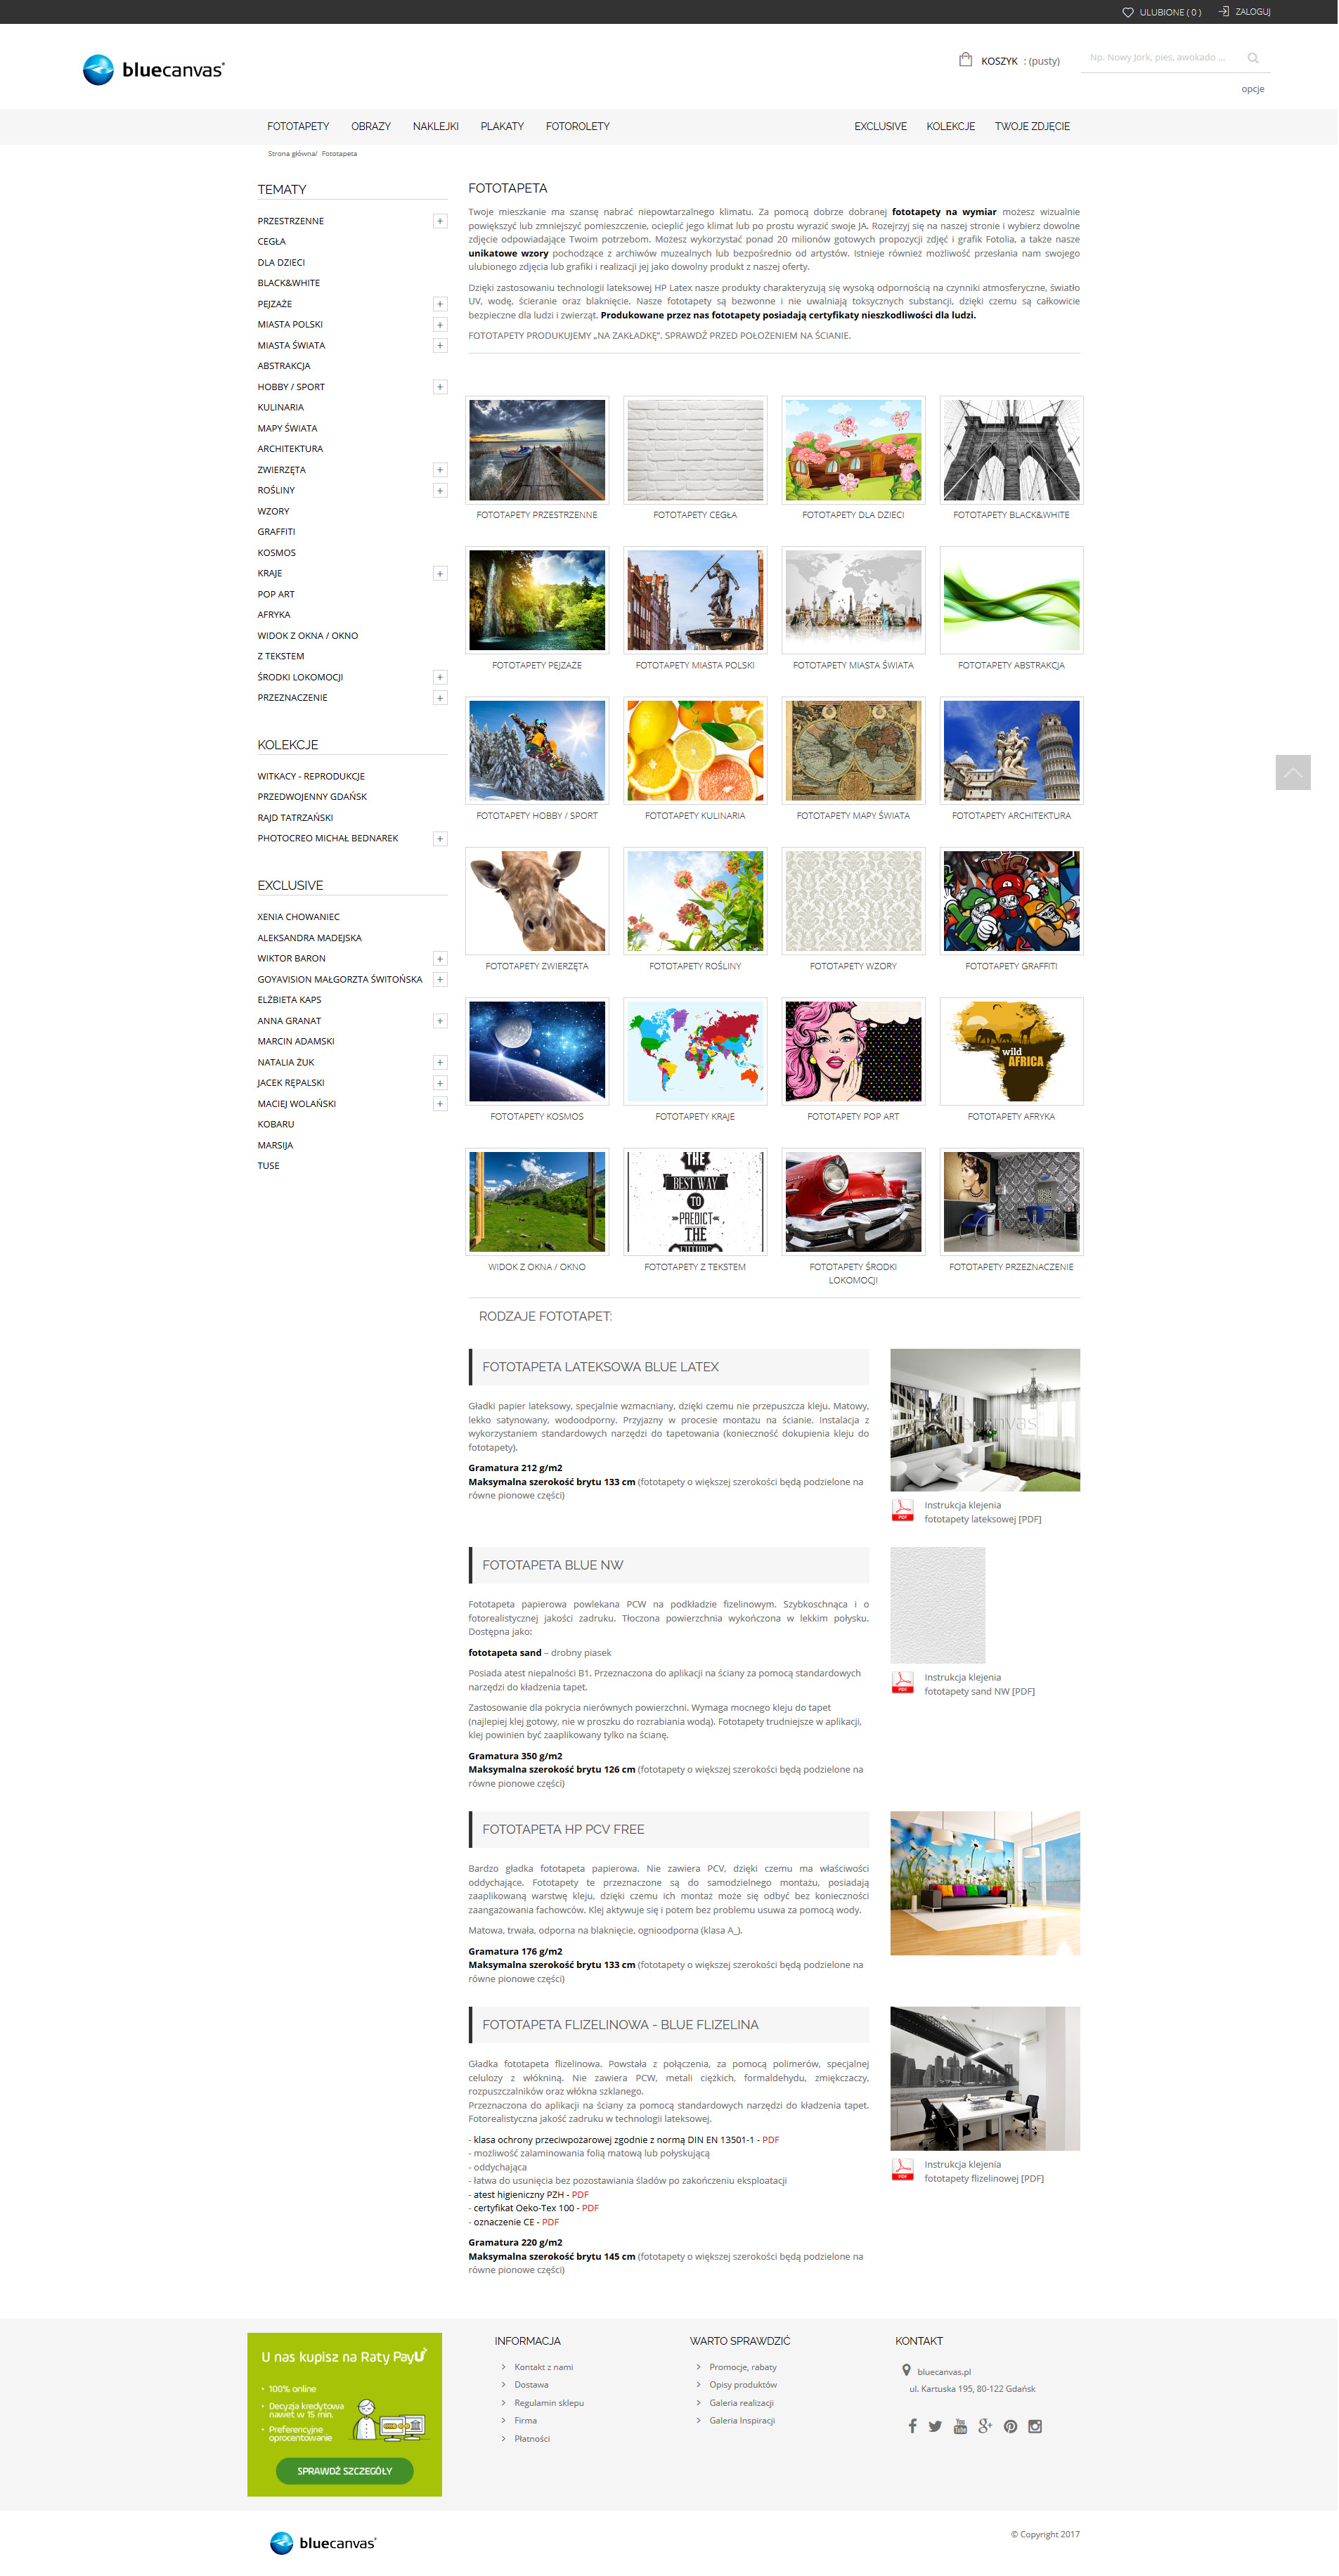 sklep internetowy bluecanvas.pl